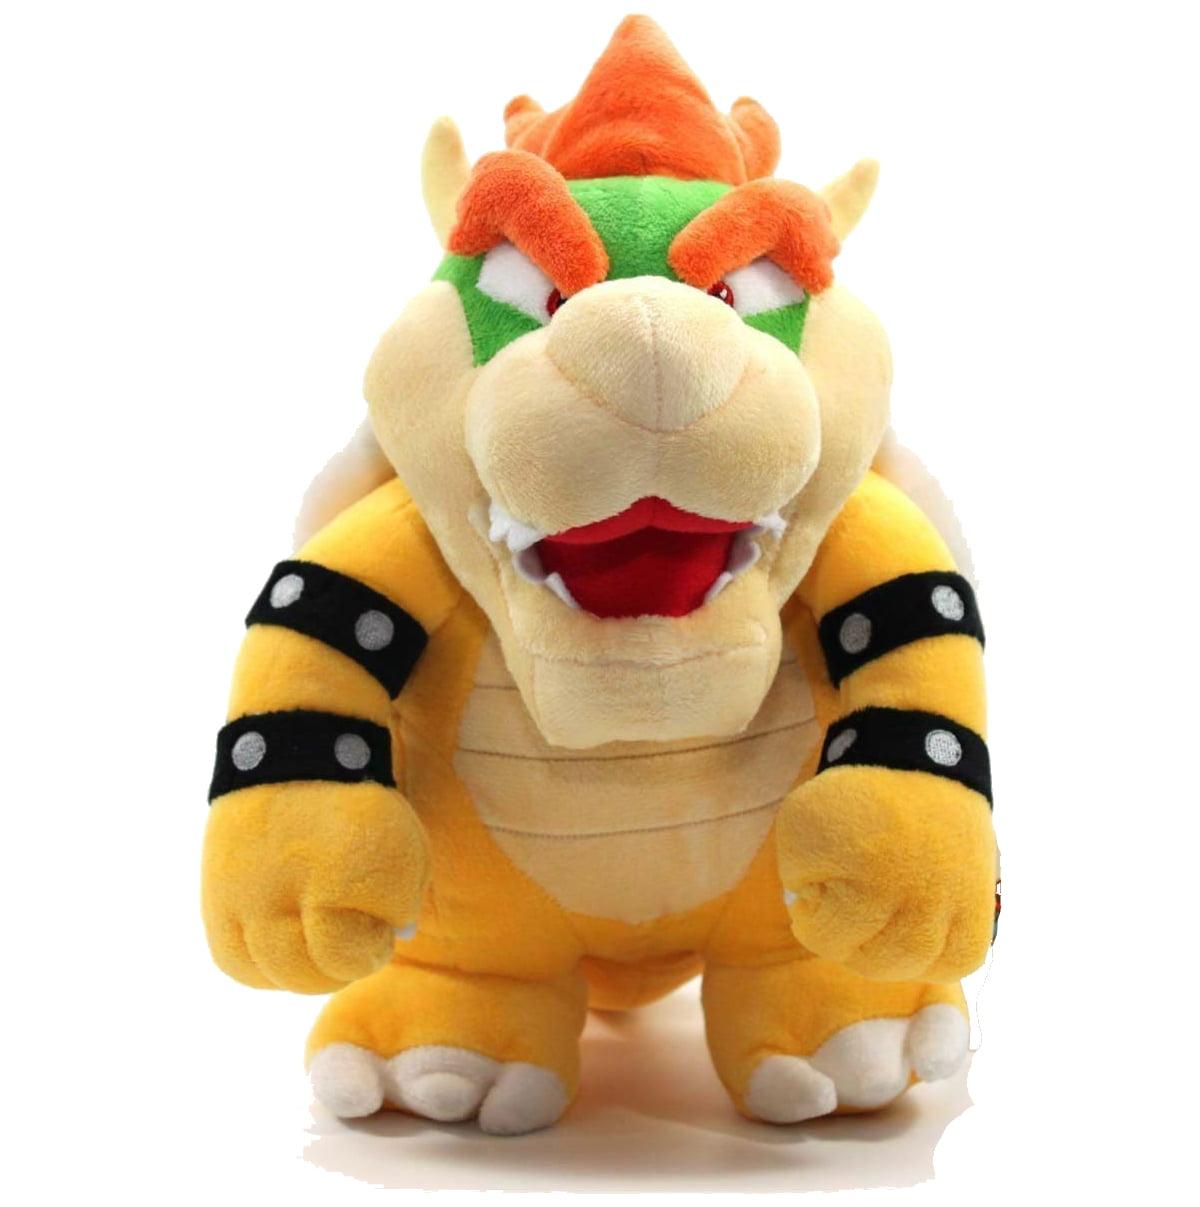 "King Bowser Plush Nintendo Mario Kart Toys 10"" Super Mario Collectors Plush Bowser Soft Stuffed Plush Toy... by"